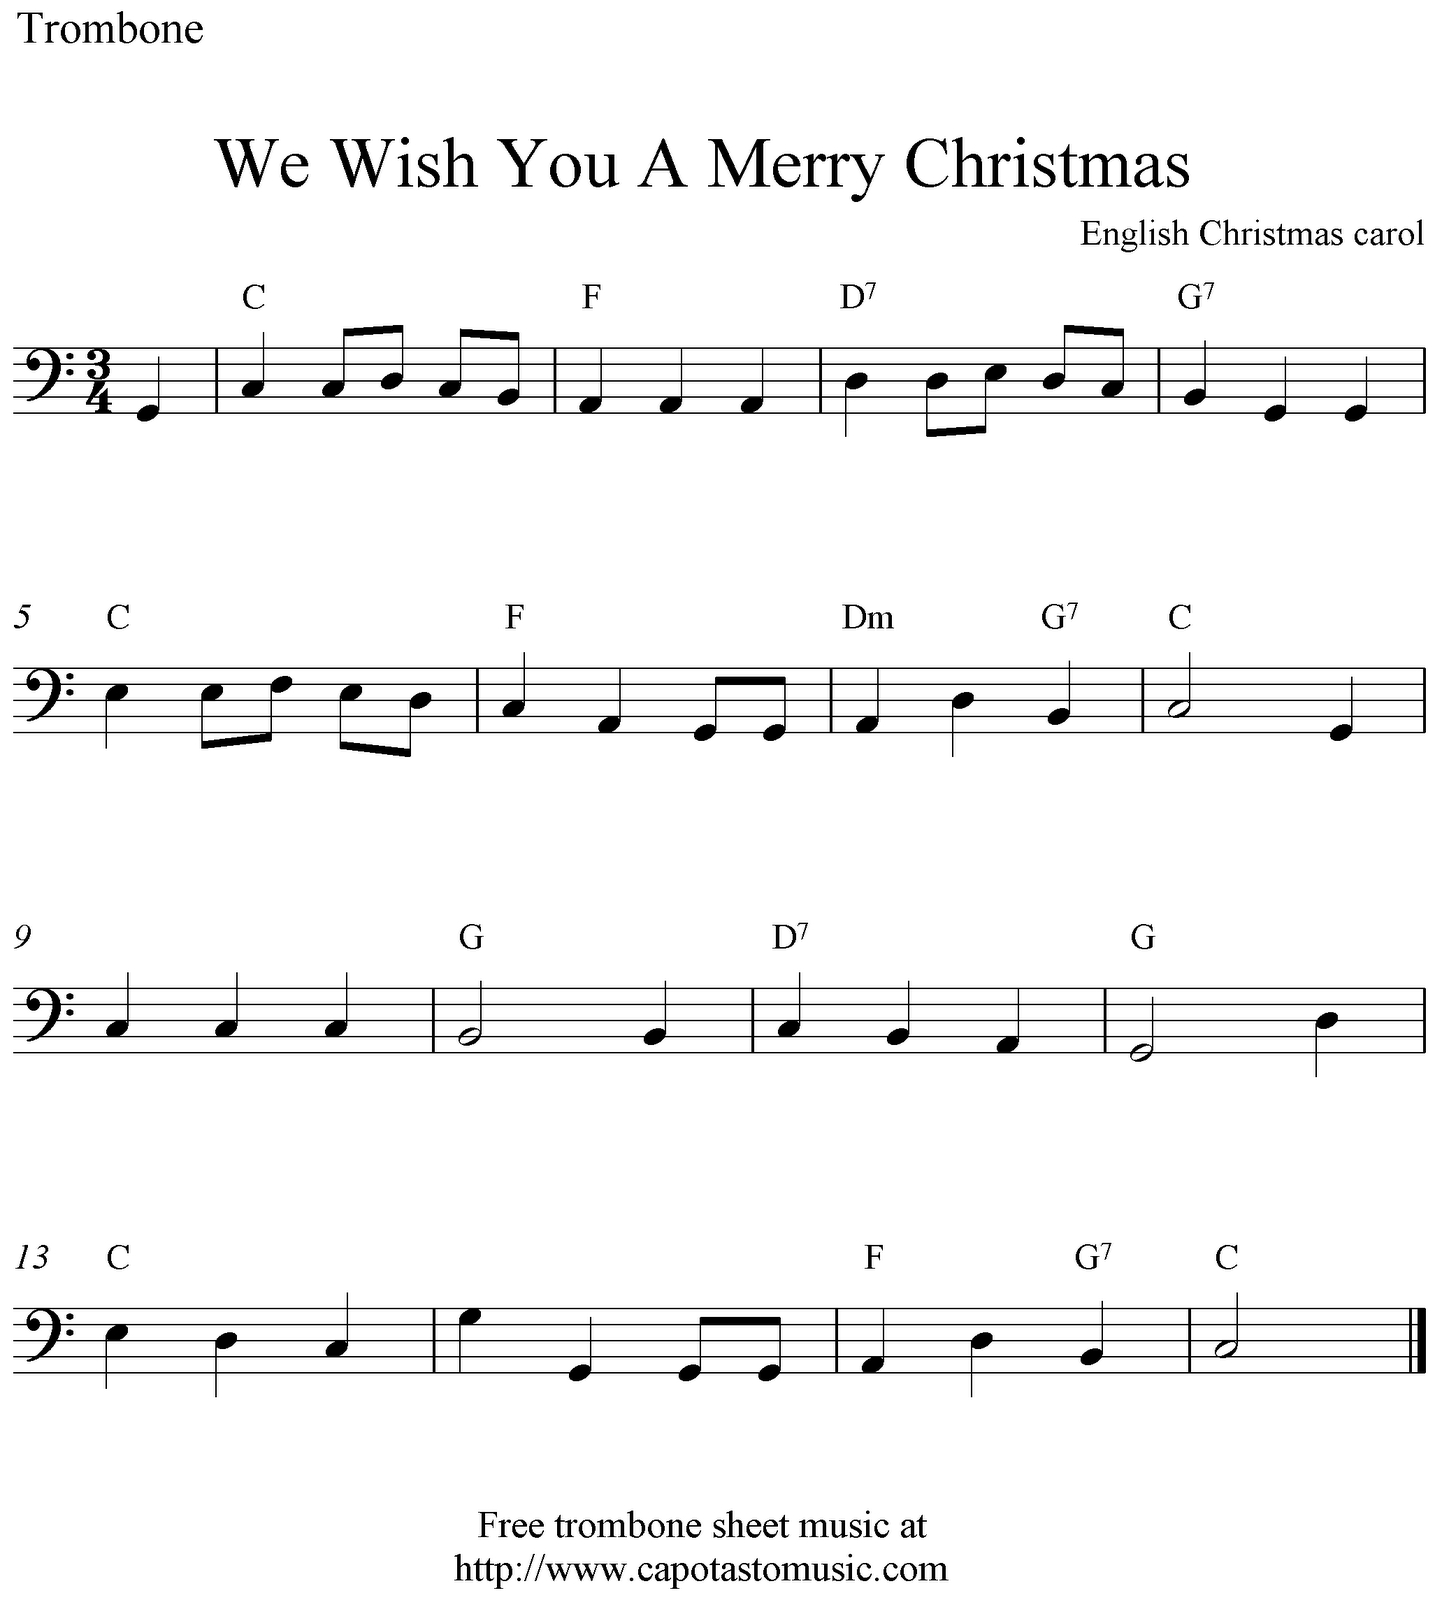 70 Melodious Christmas Piano Sheet Music | Kittybabylove - Free Christmas Sheet Music For Keyboard Printable